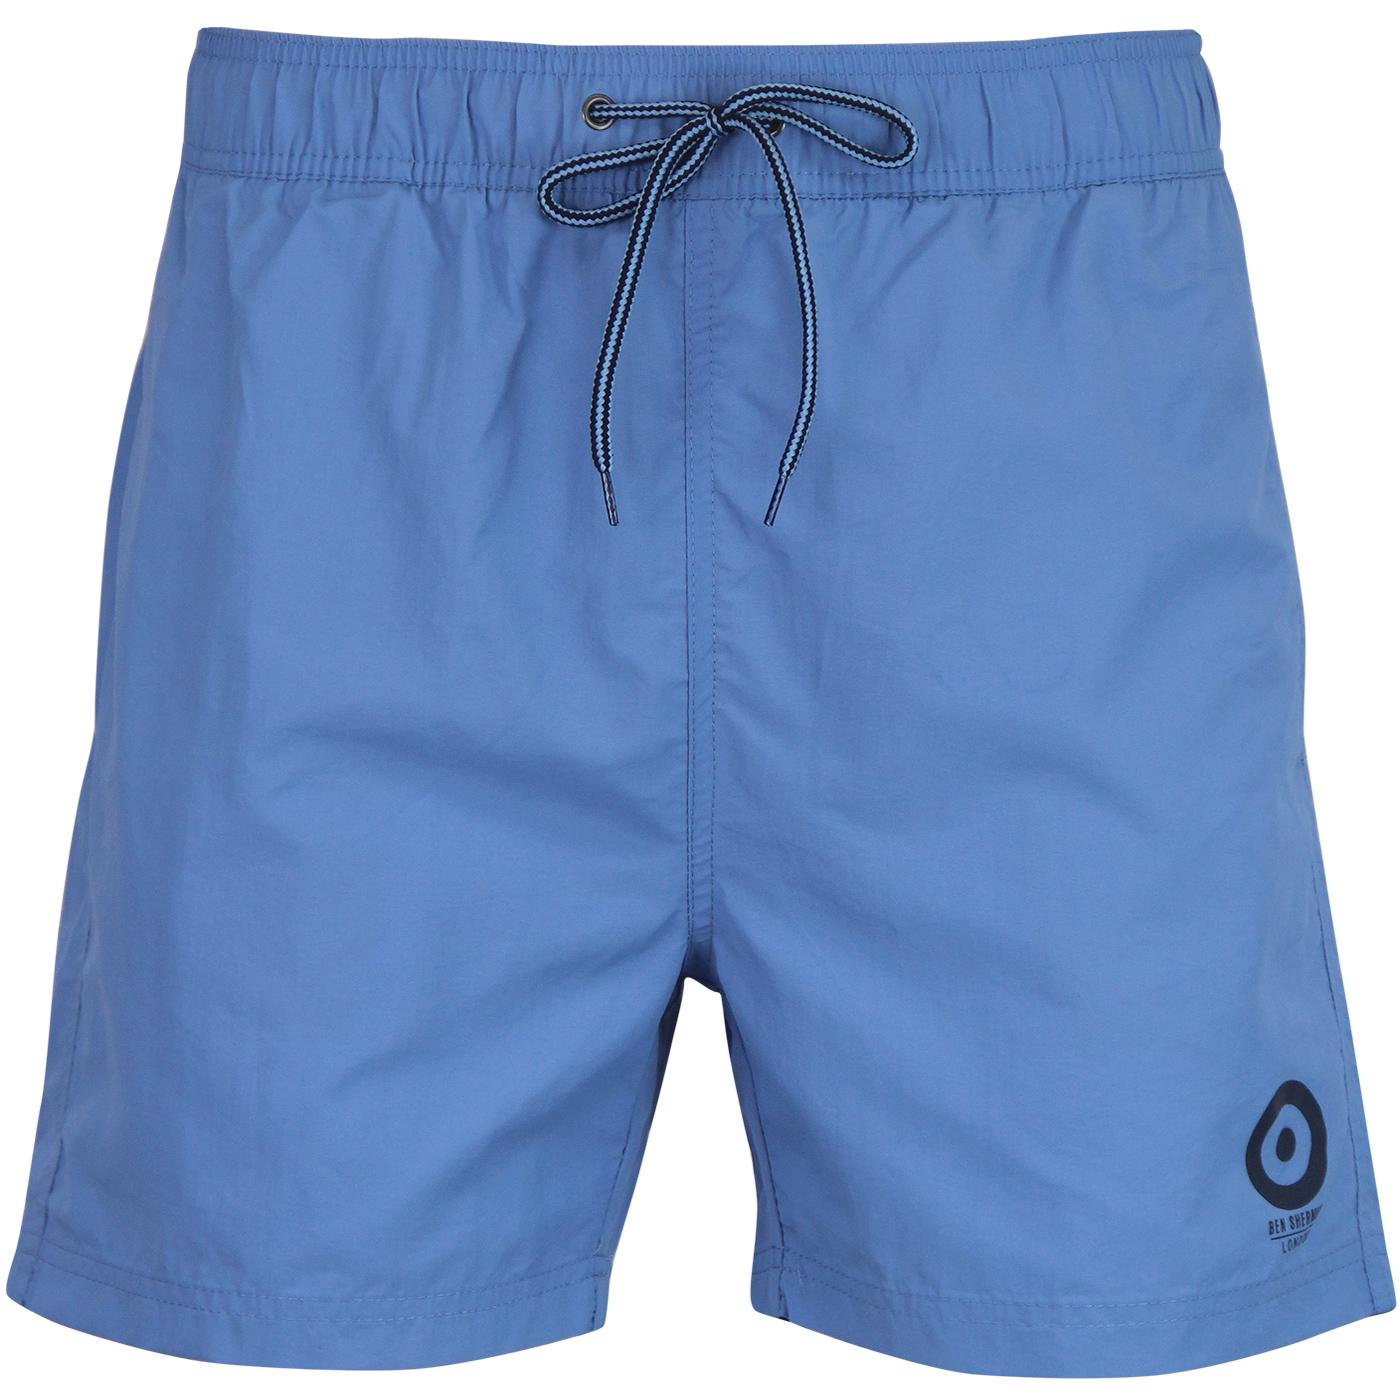 Bathsheba BEN SHERMAN Retro Swim Shorts (Cobalt)